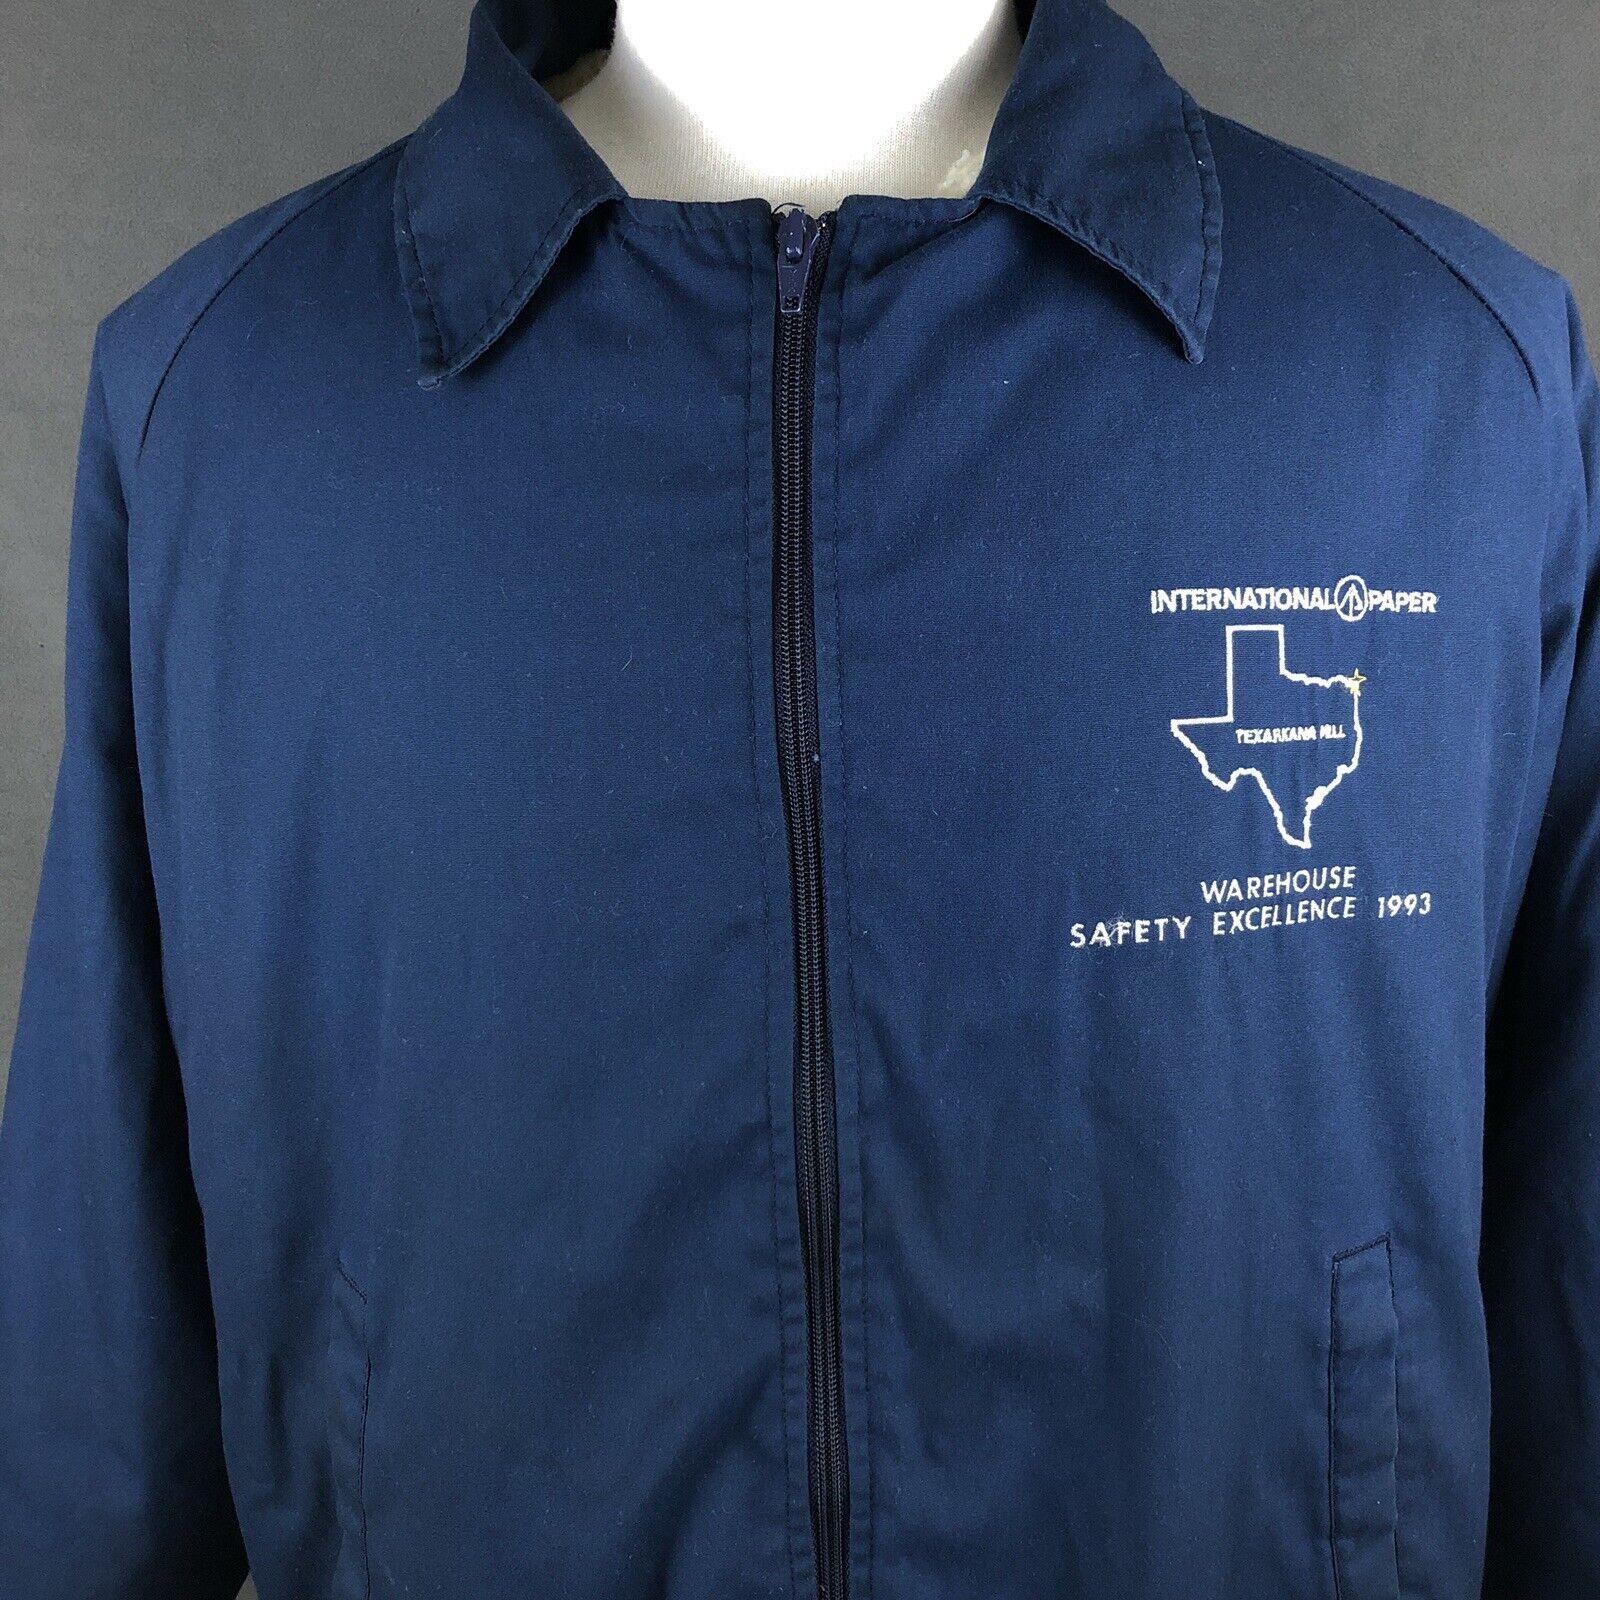 International Paper Texas Employee Jacket Large Sherpa Lined Coat Vintage 1993